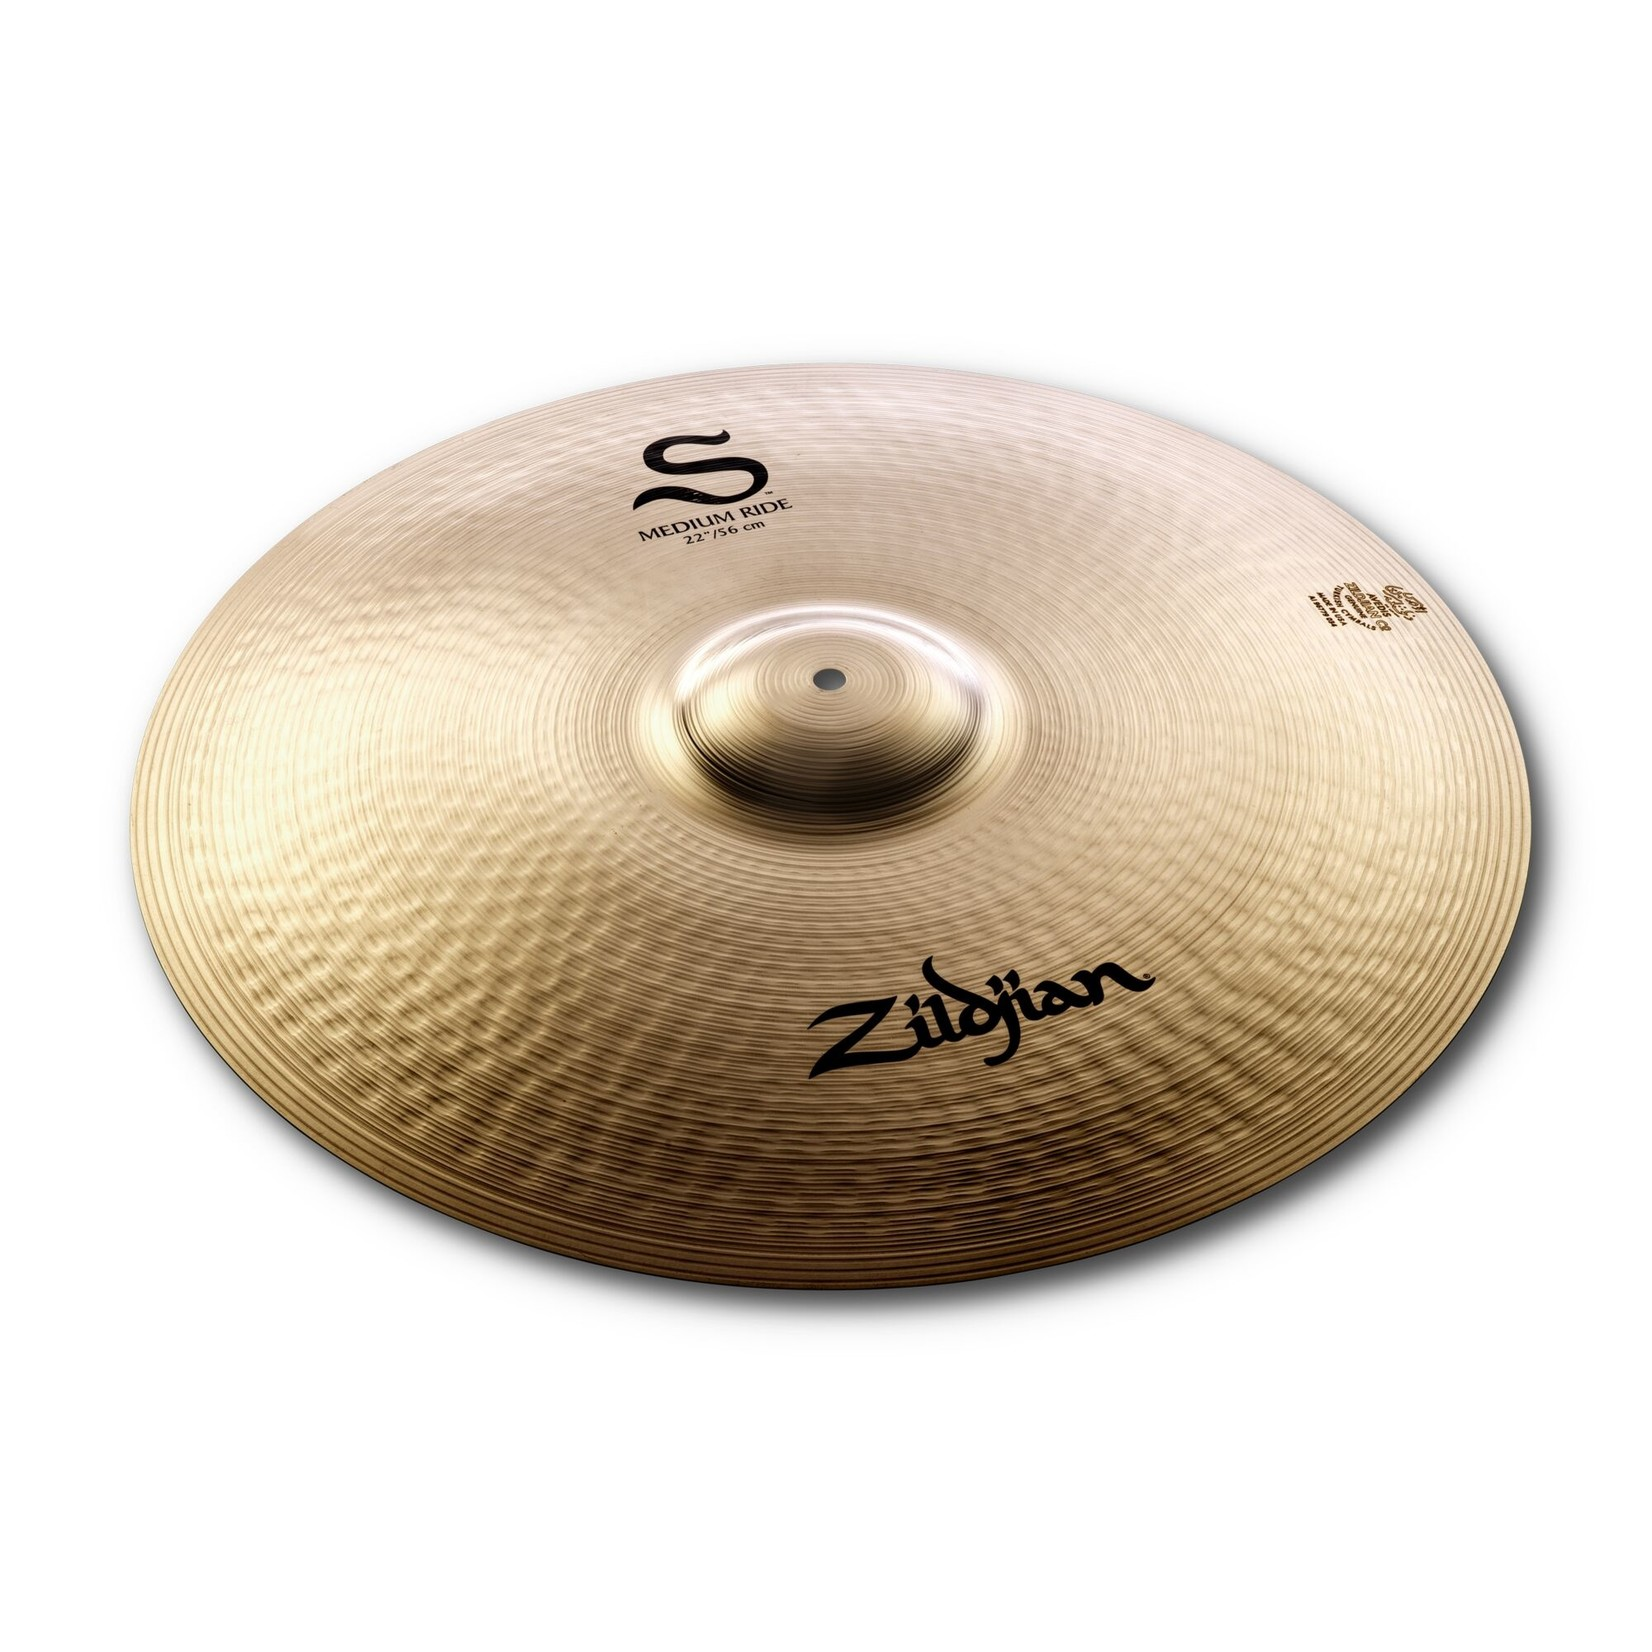 "Zildjian Zildjian 22"" S Medium Ride"